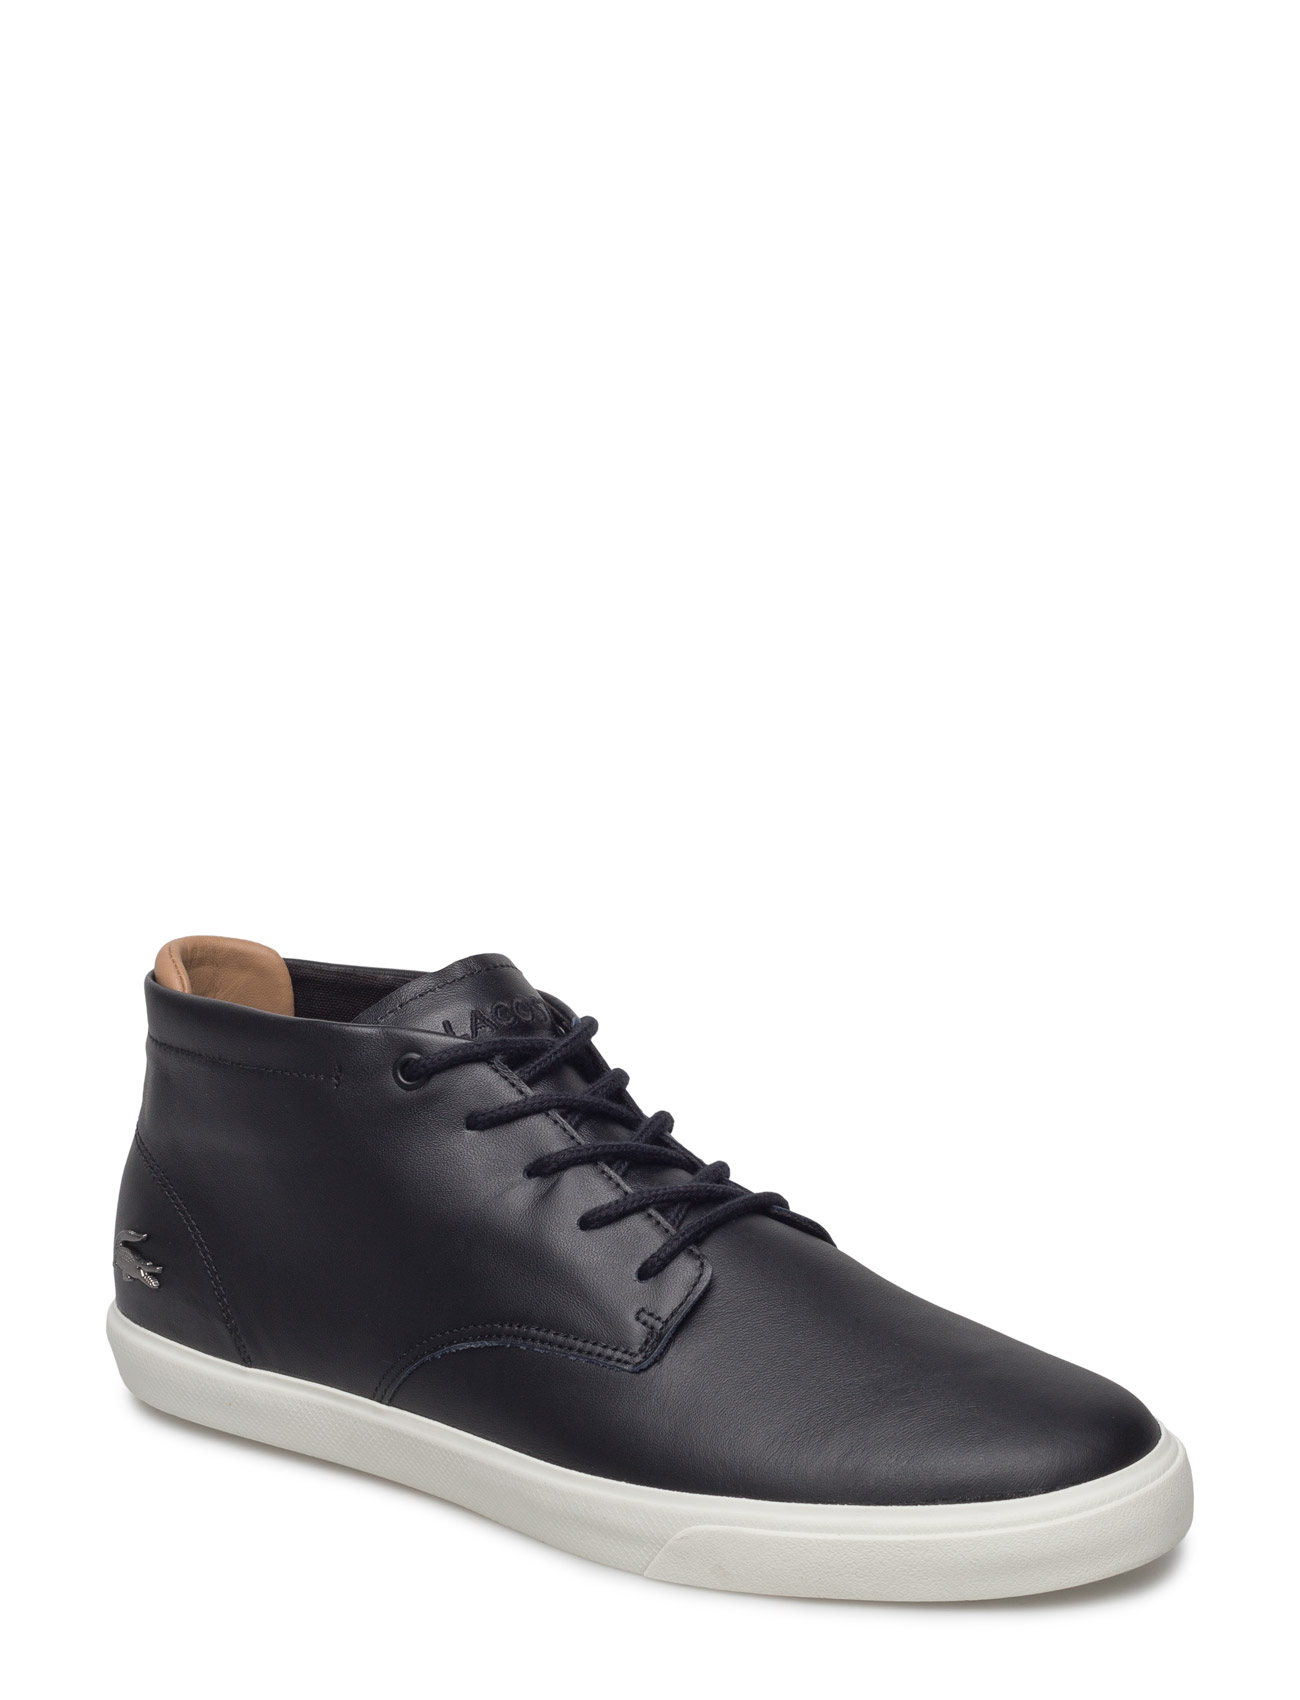 lacoste shoes Espere chukka 317 1 fra boozt.com dk